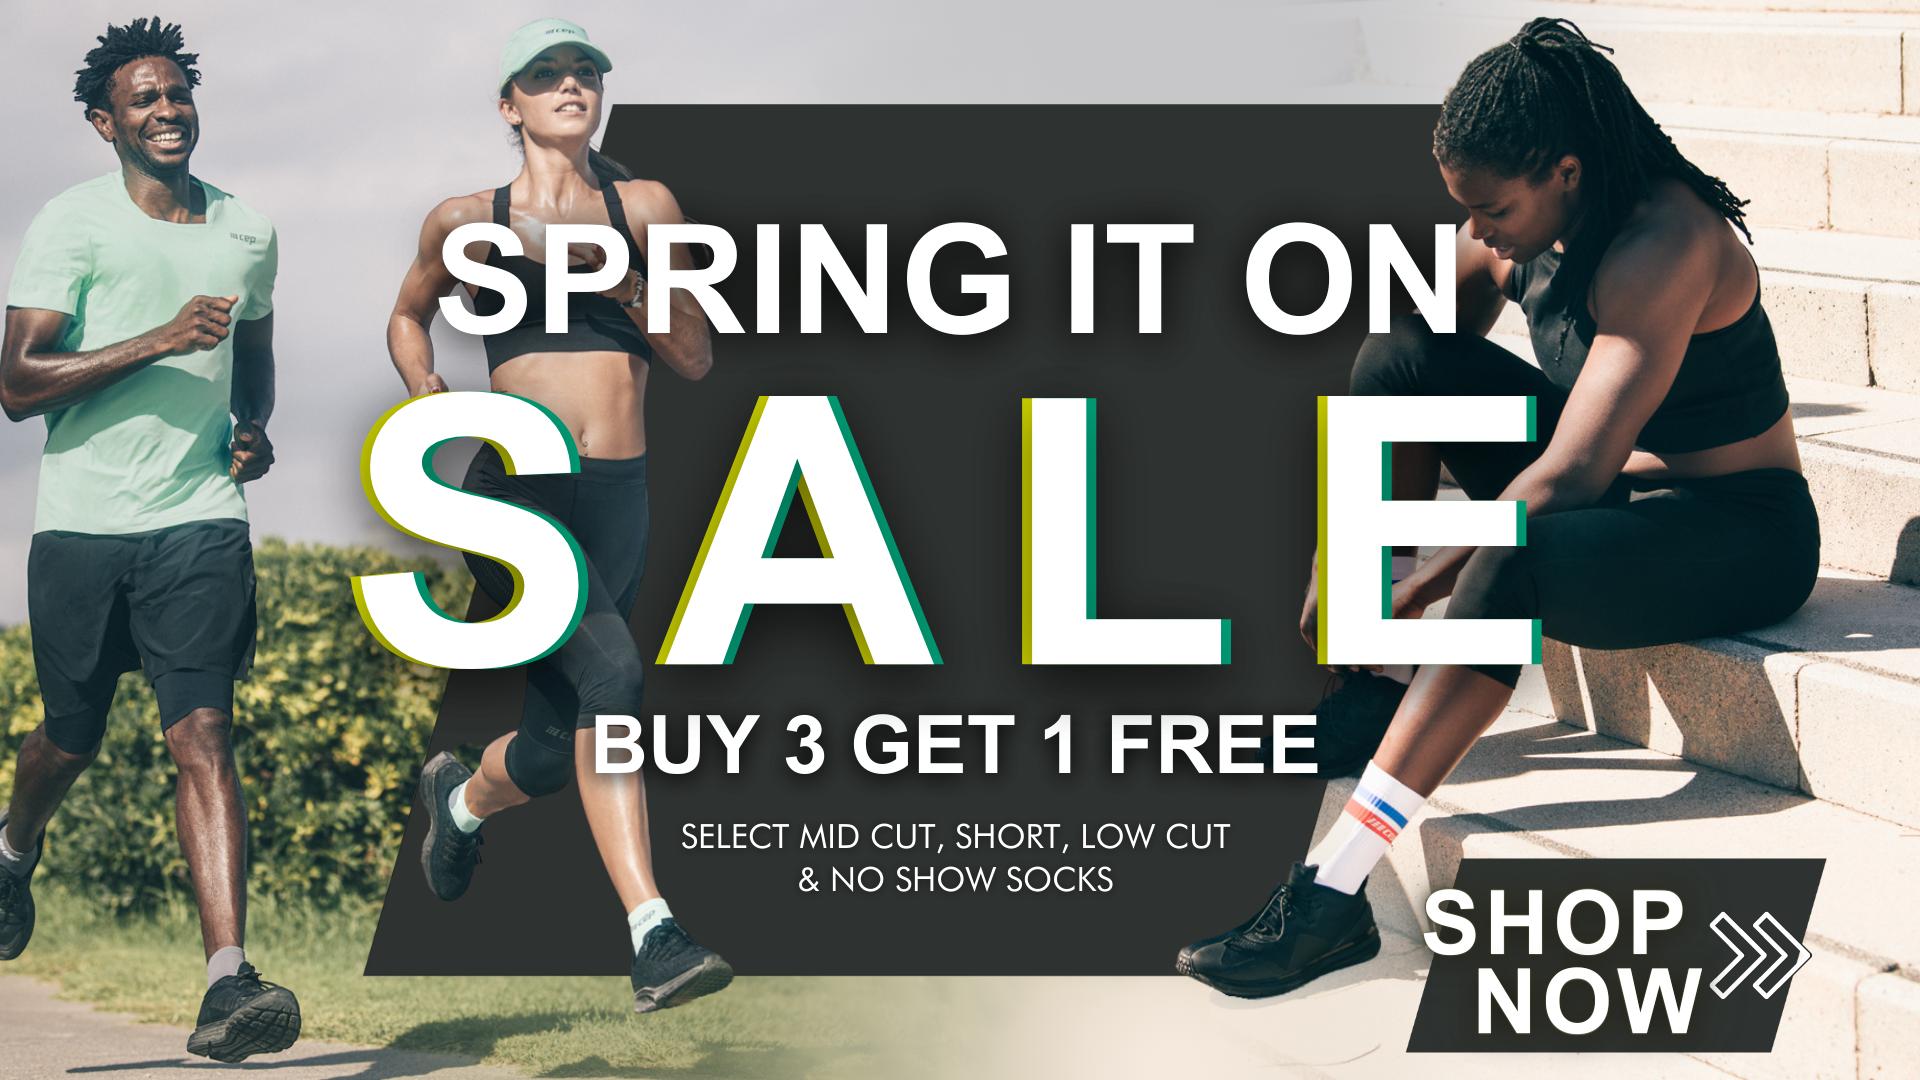 Buy 3 Get 1 Free on select Compression Socks Sale